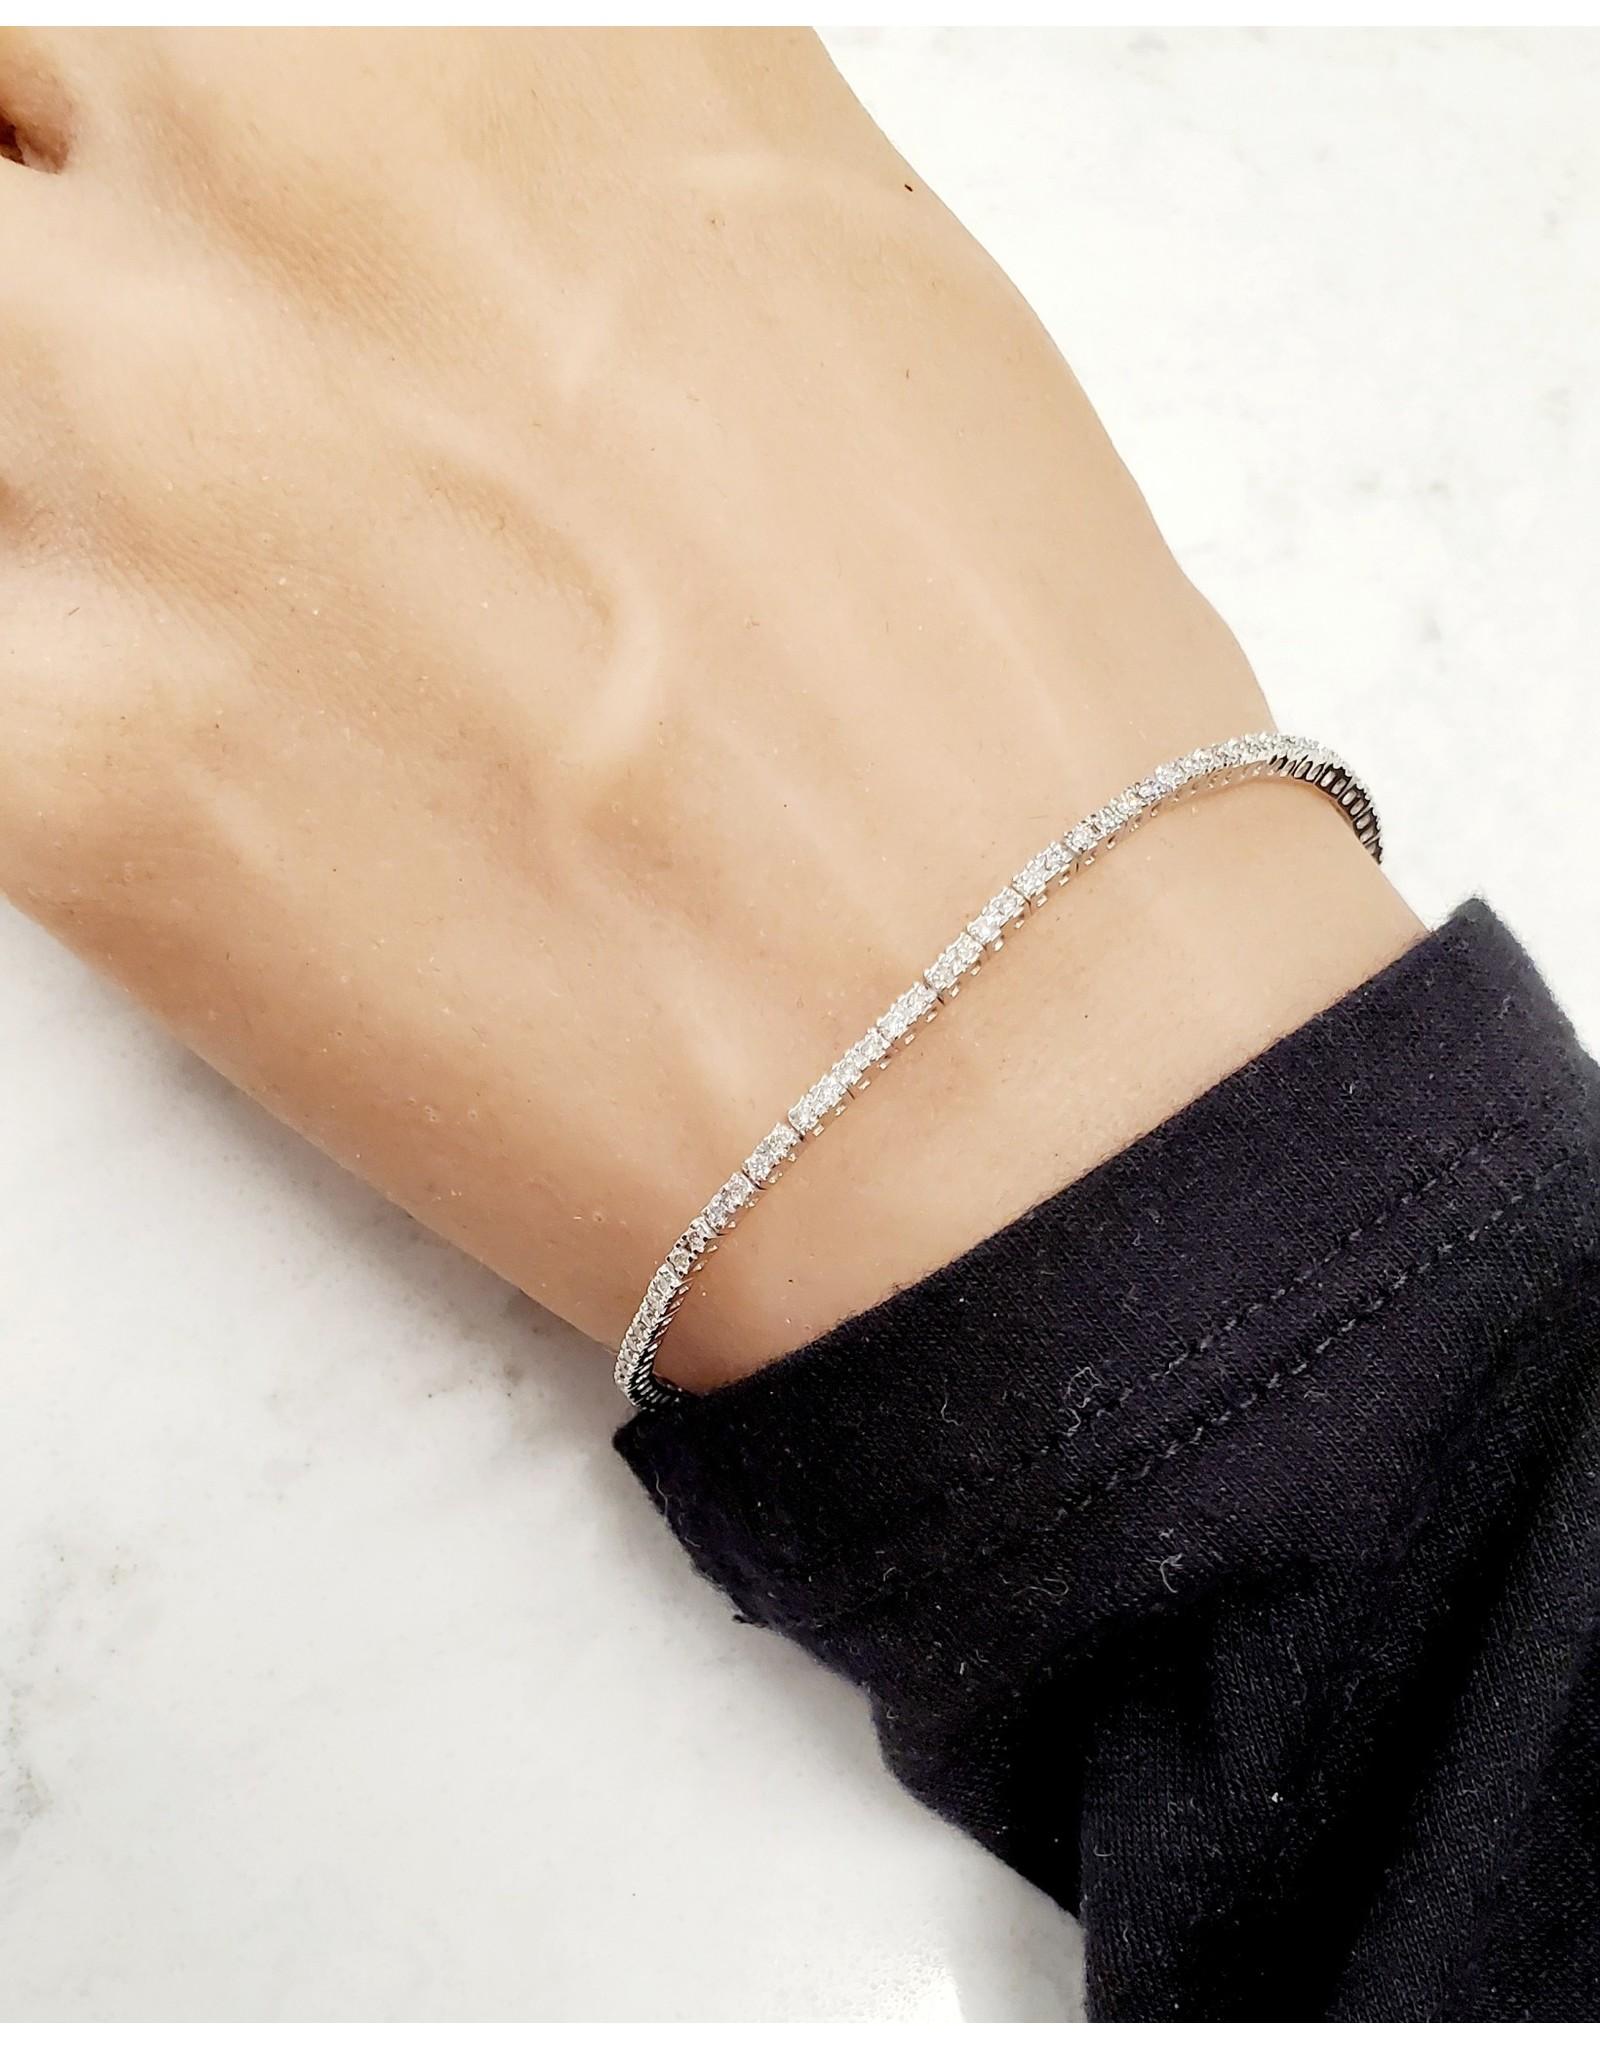 14K White Gold Dainty Diamond Tennis Bracelet, D: 1ct